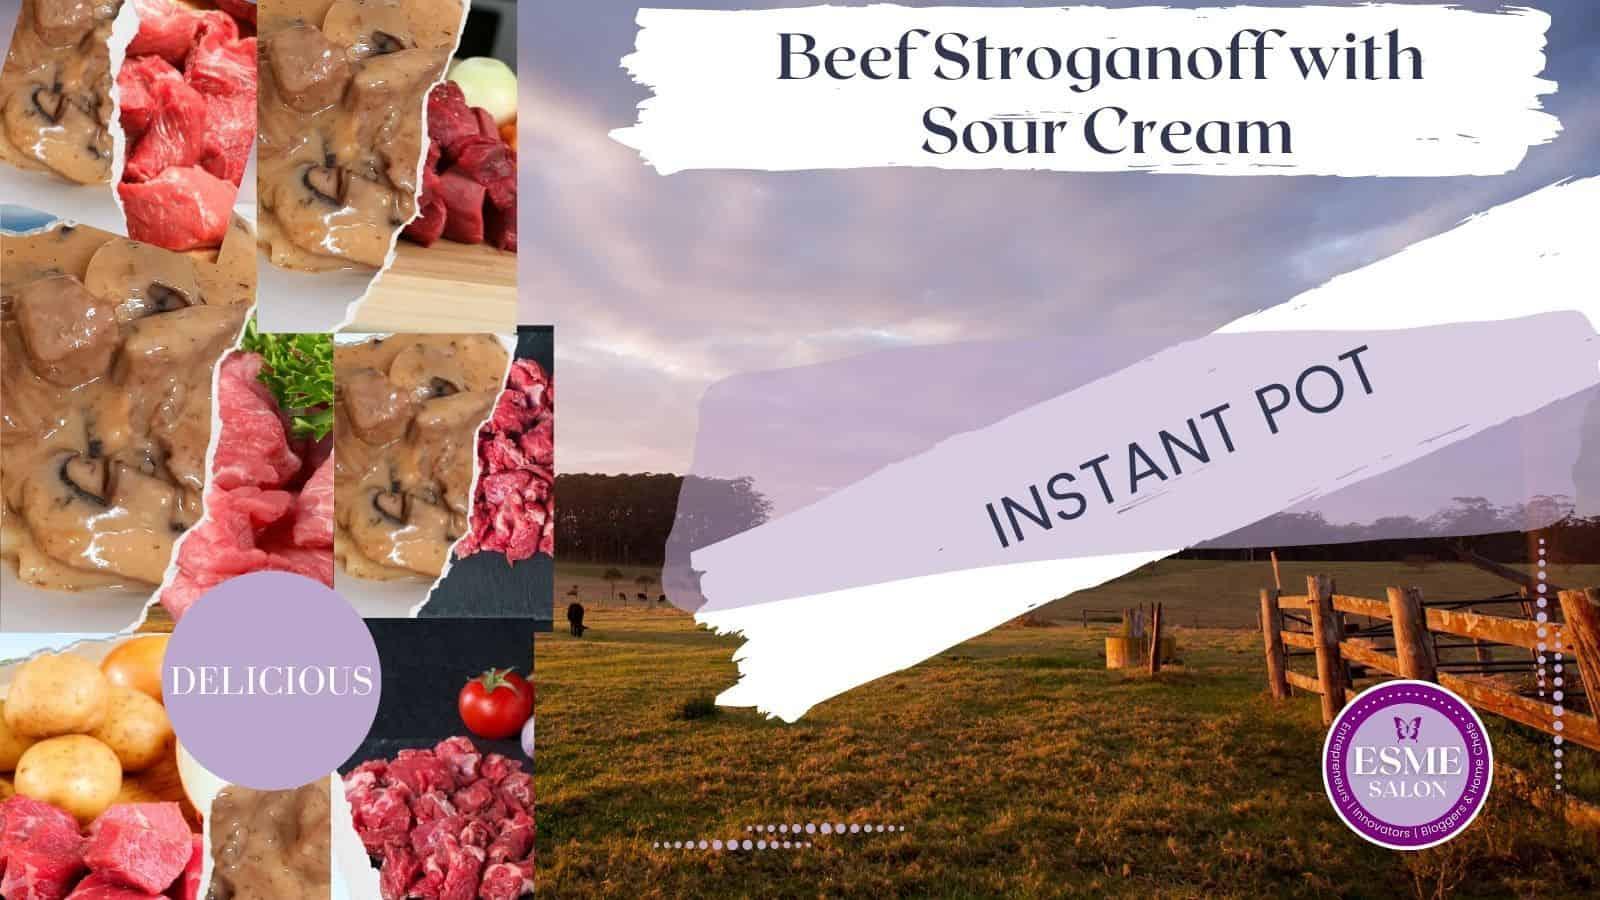 Beef Stroganoff with Sour Cream